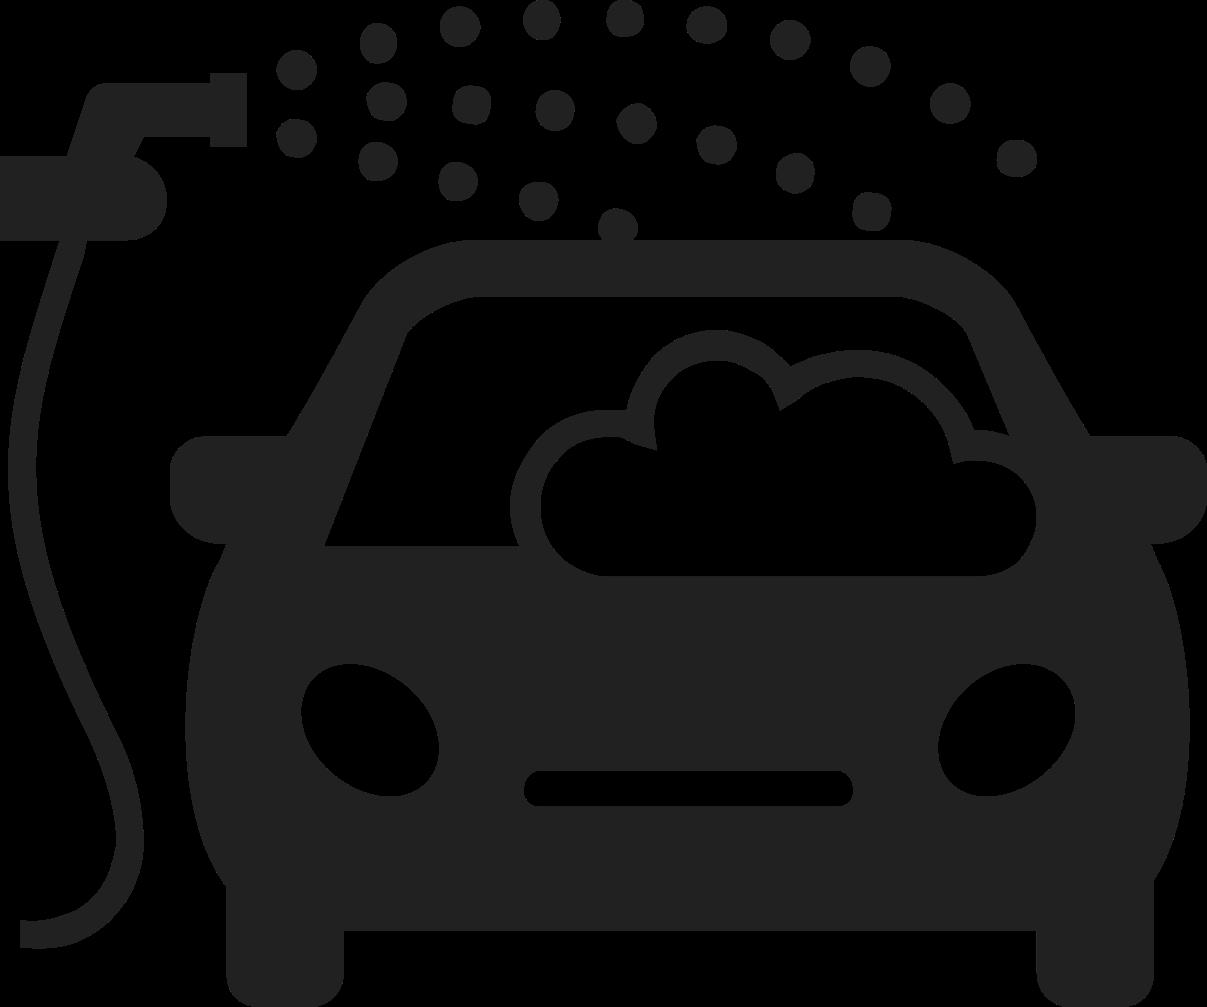 icône lavages voiture